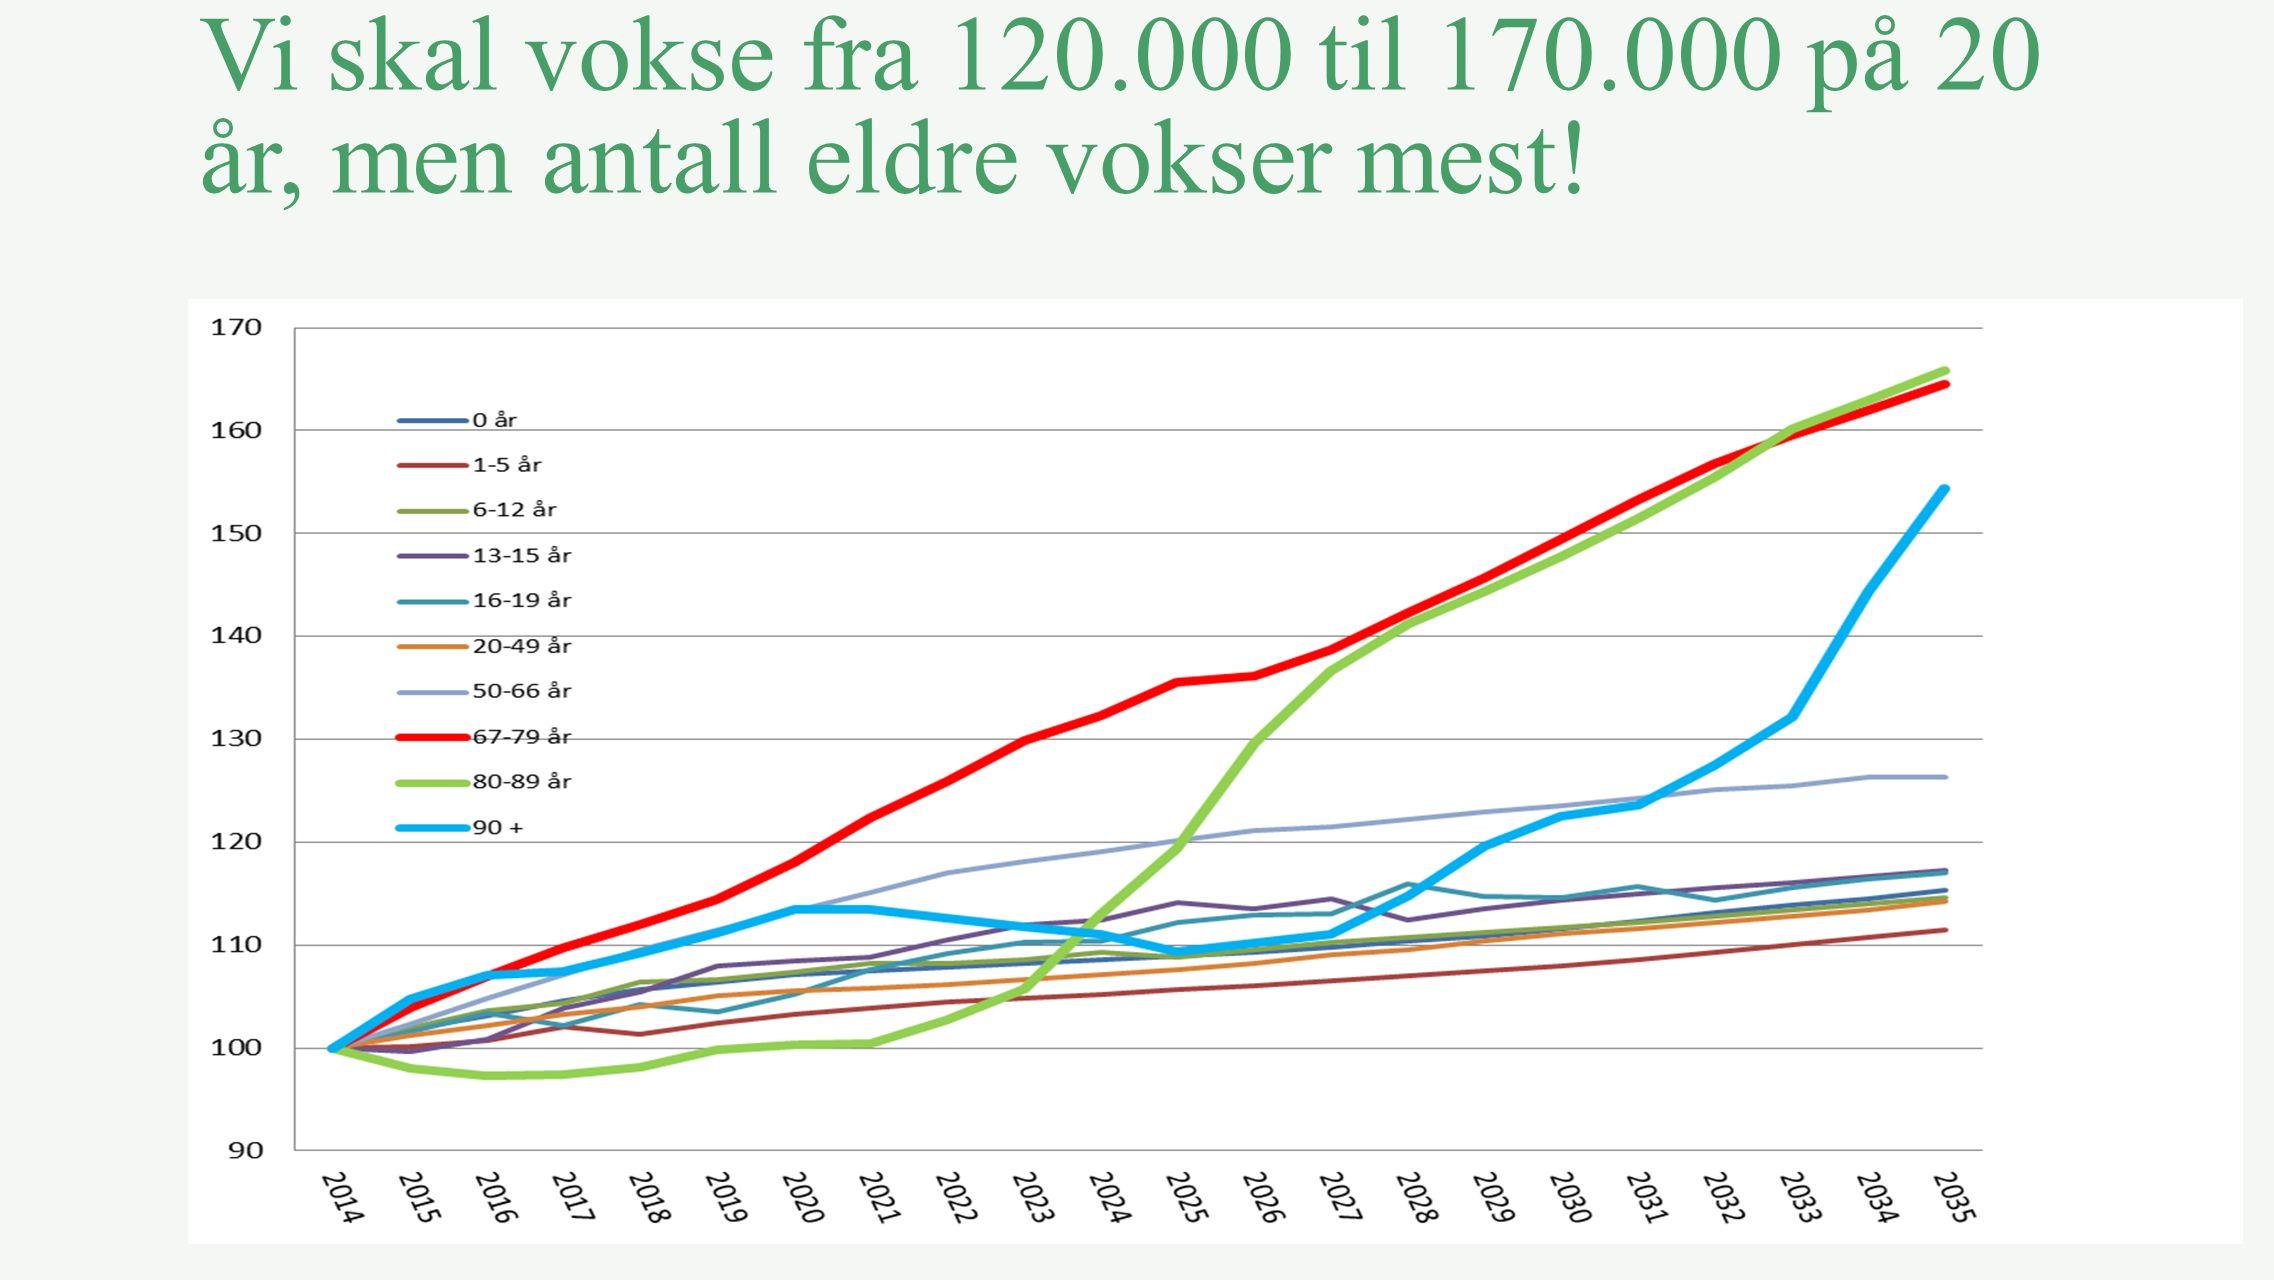 Vi skal vokse fra 120.000 til 170.000 på 20 år, men antall eldre vokser mest!